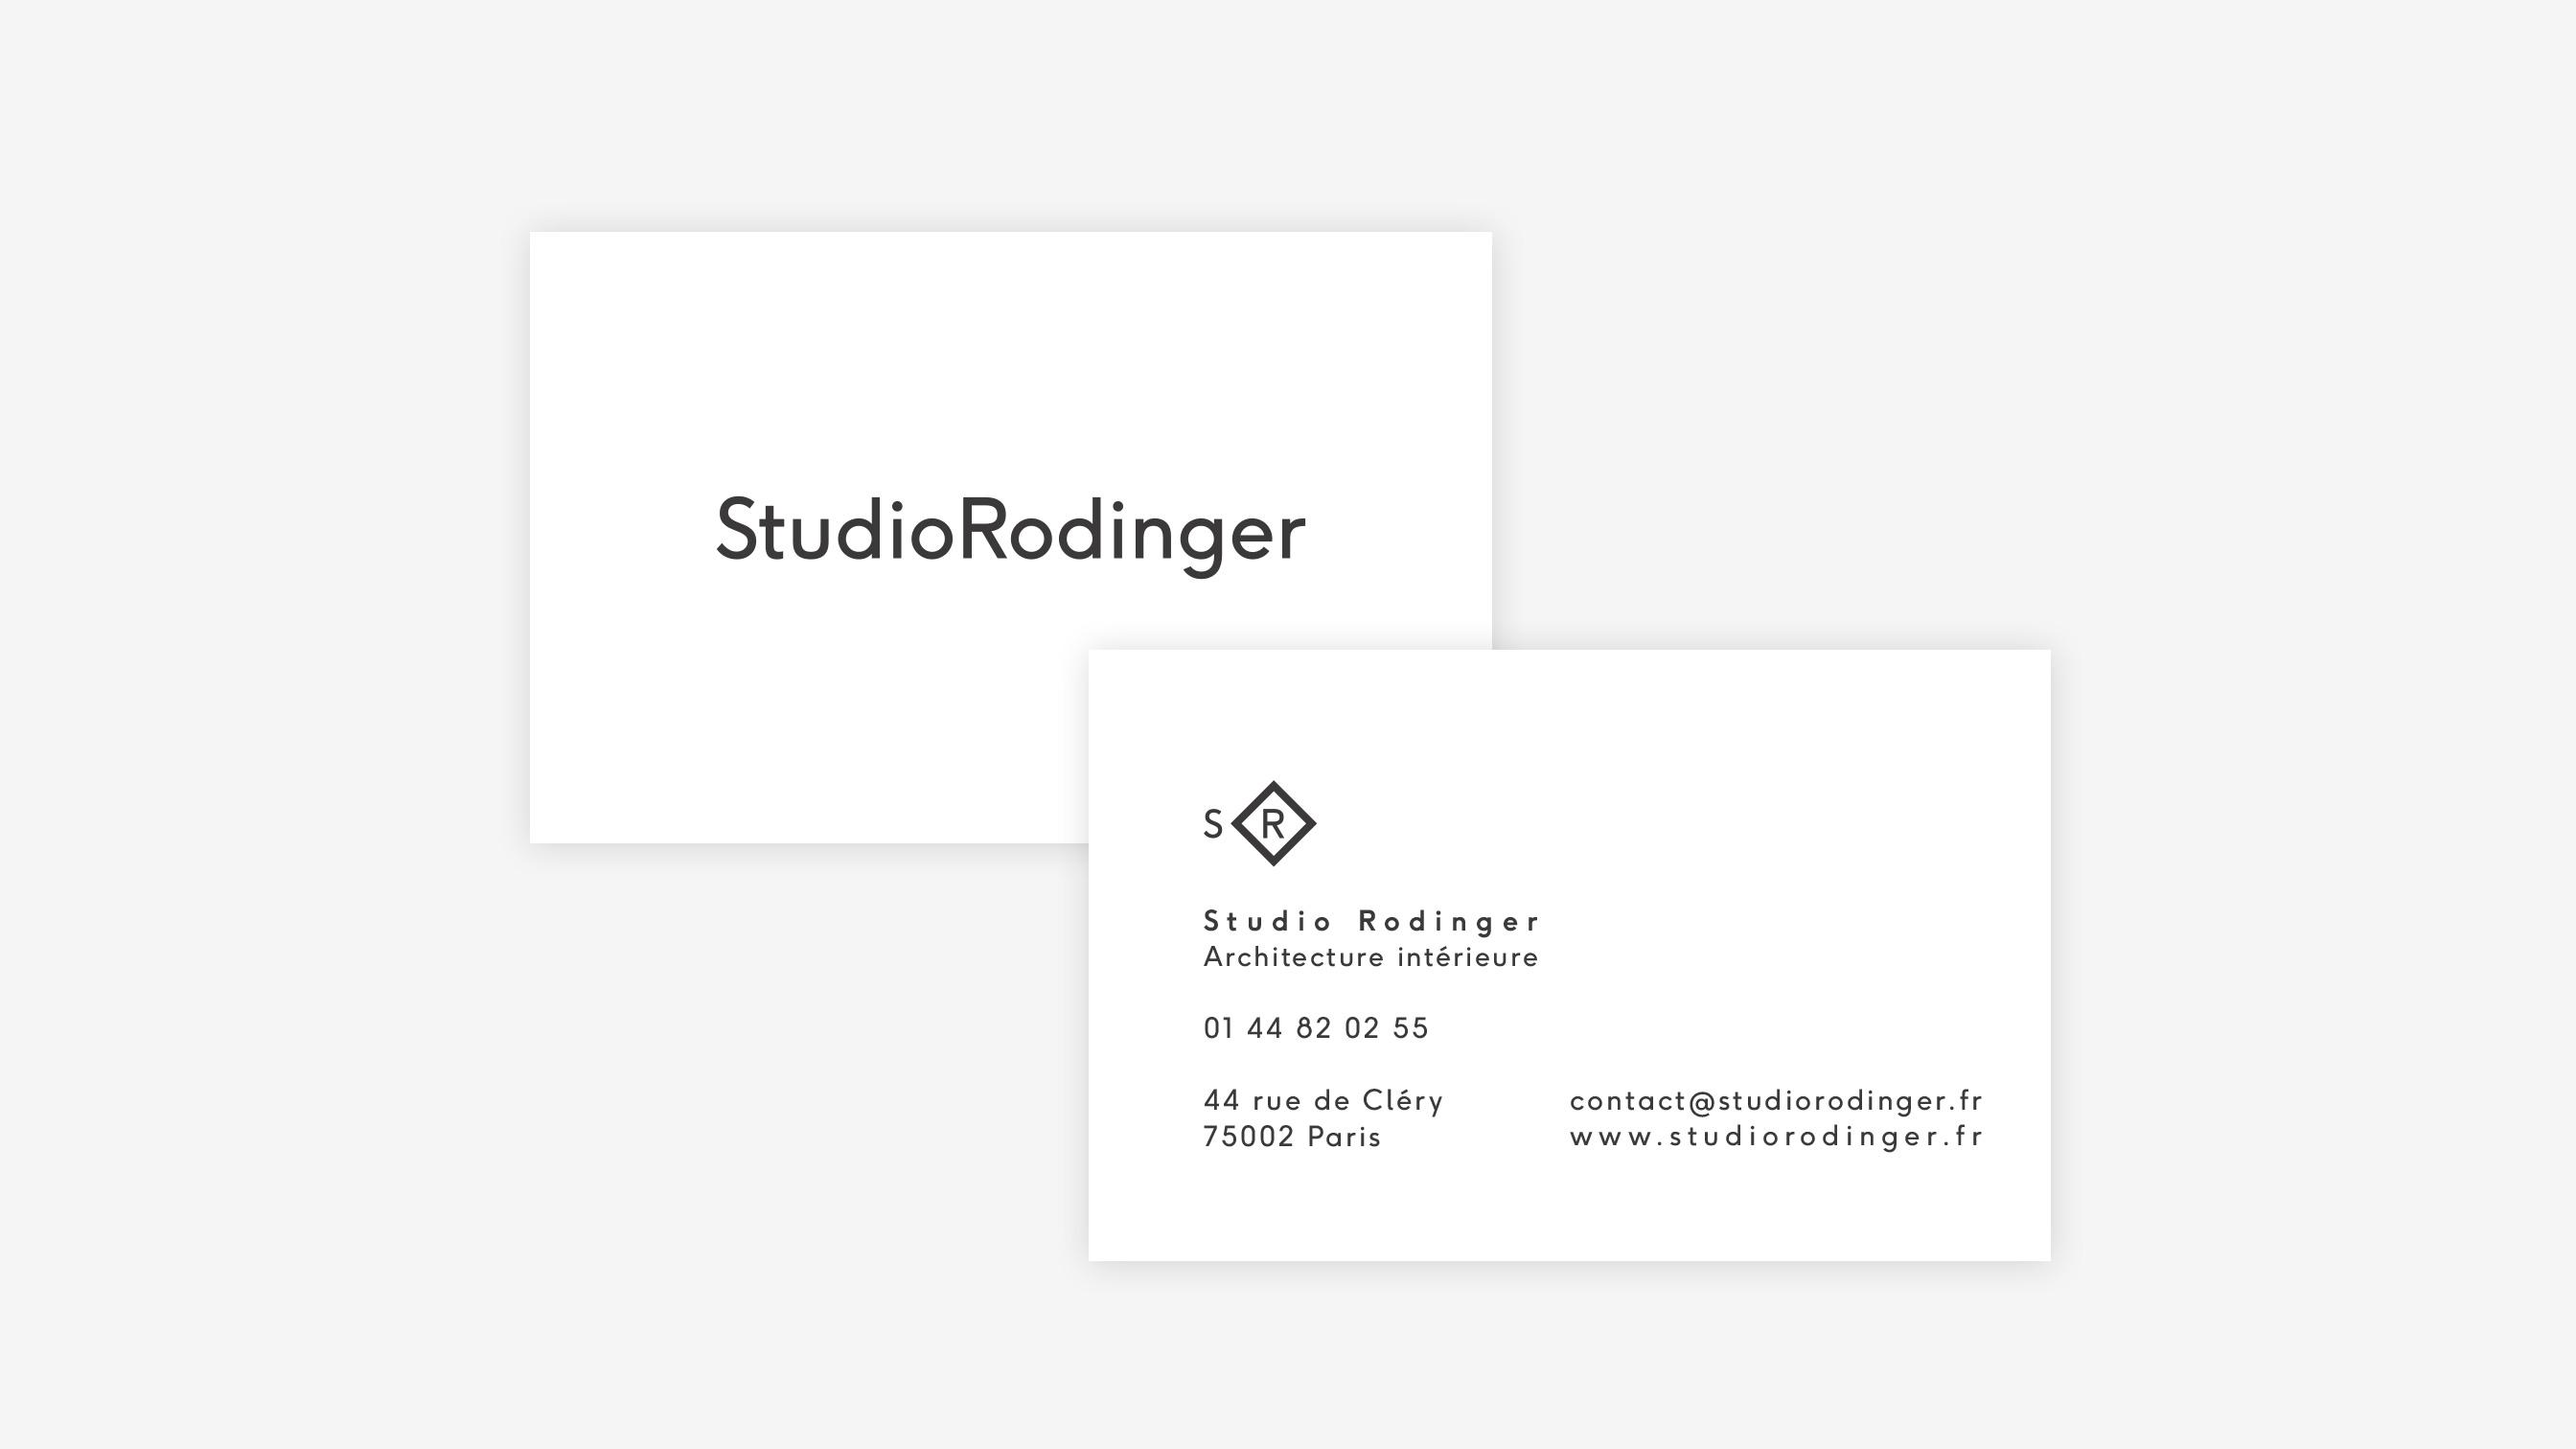 07-studio-rodinger-pikteo-webdesign-graphic-design-freelance-paris-bruxelles-londres